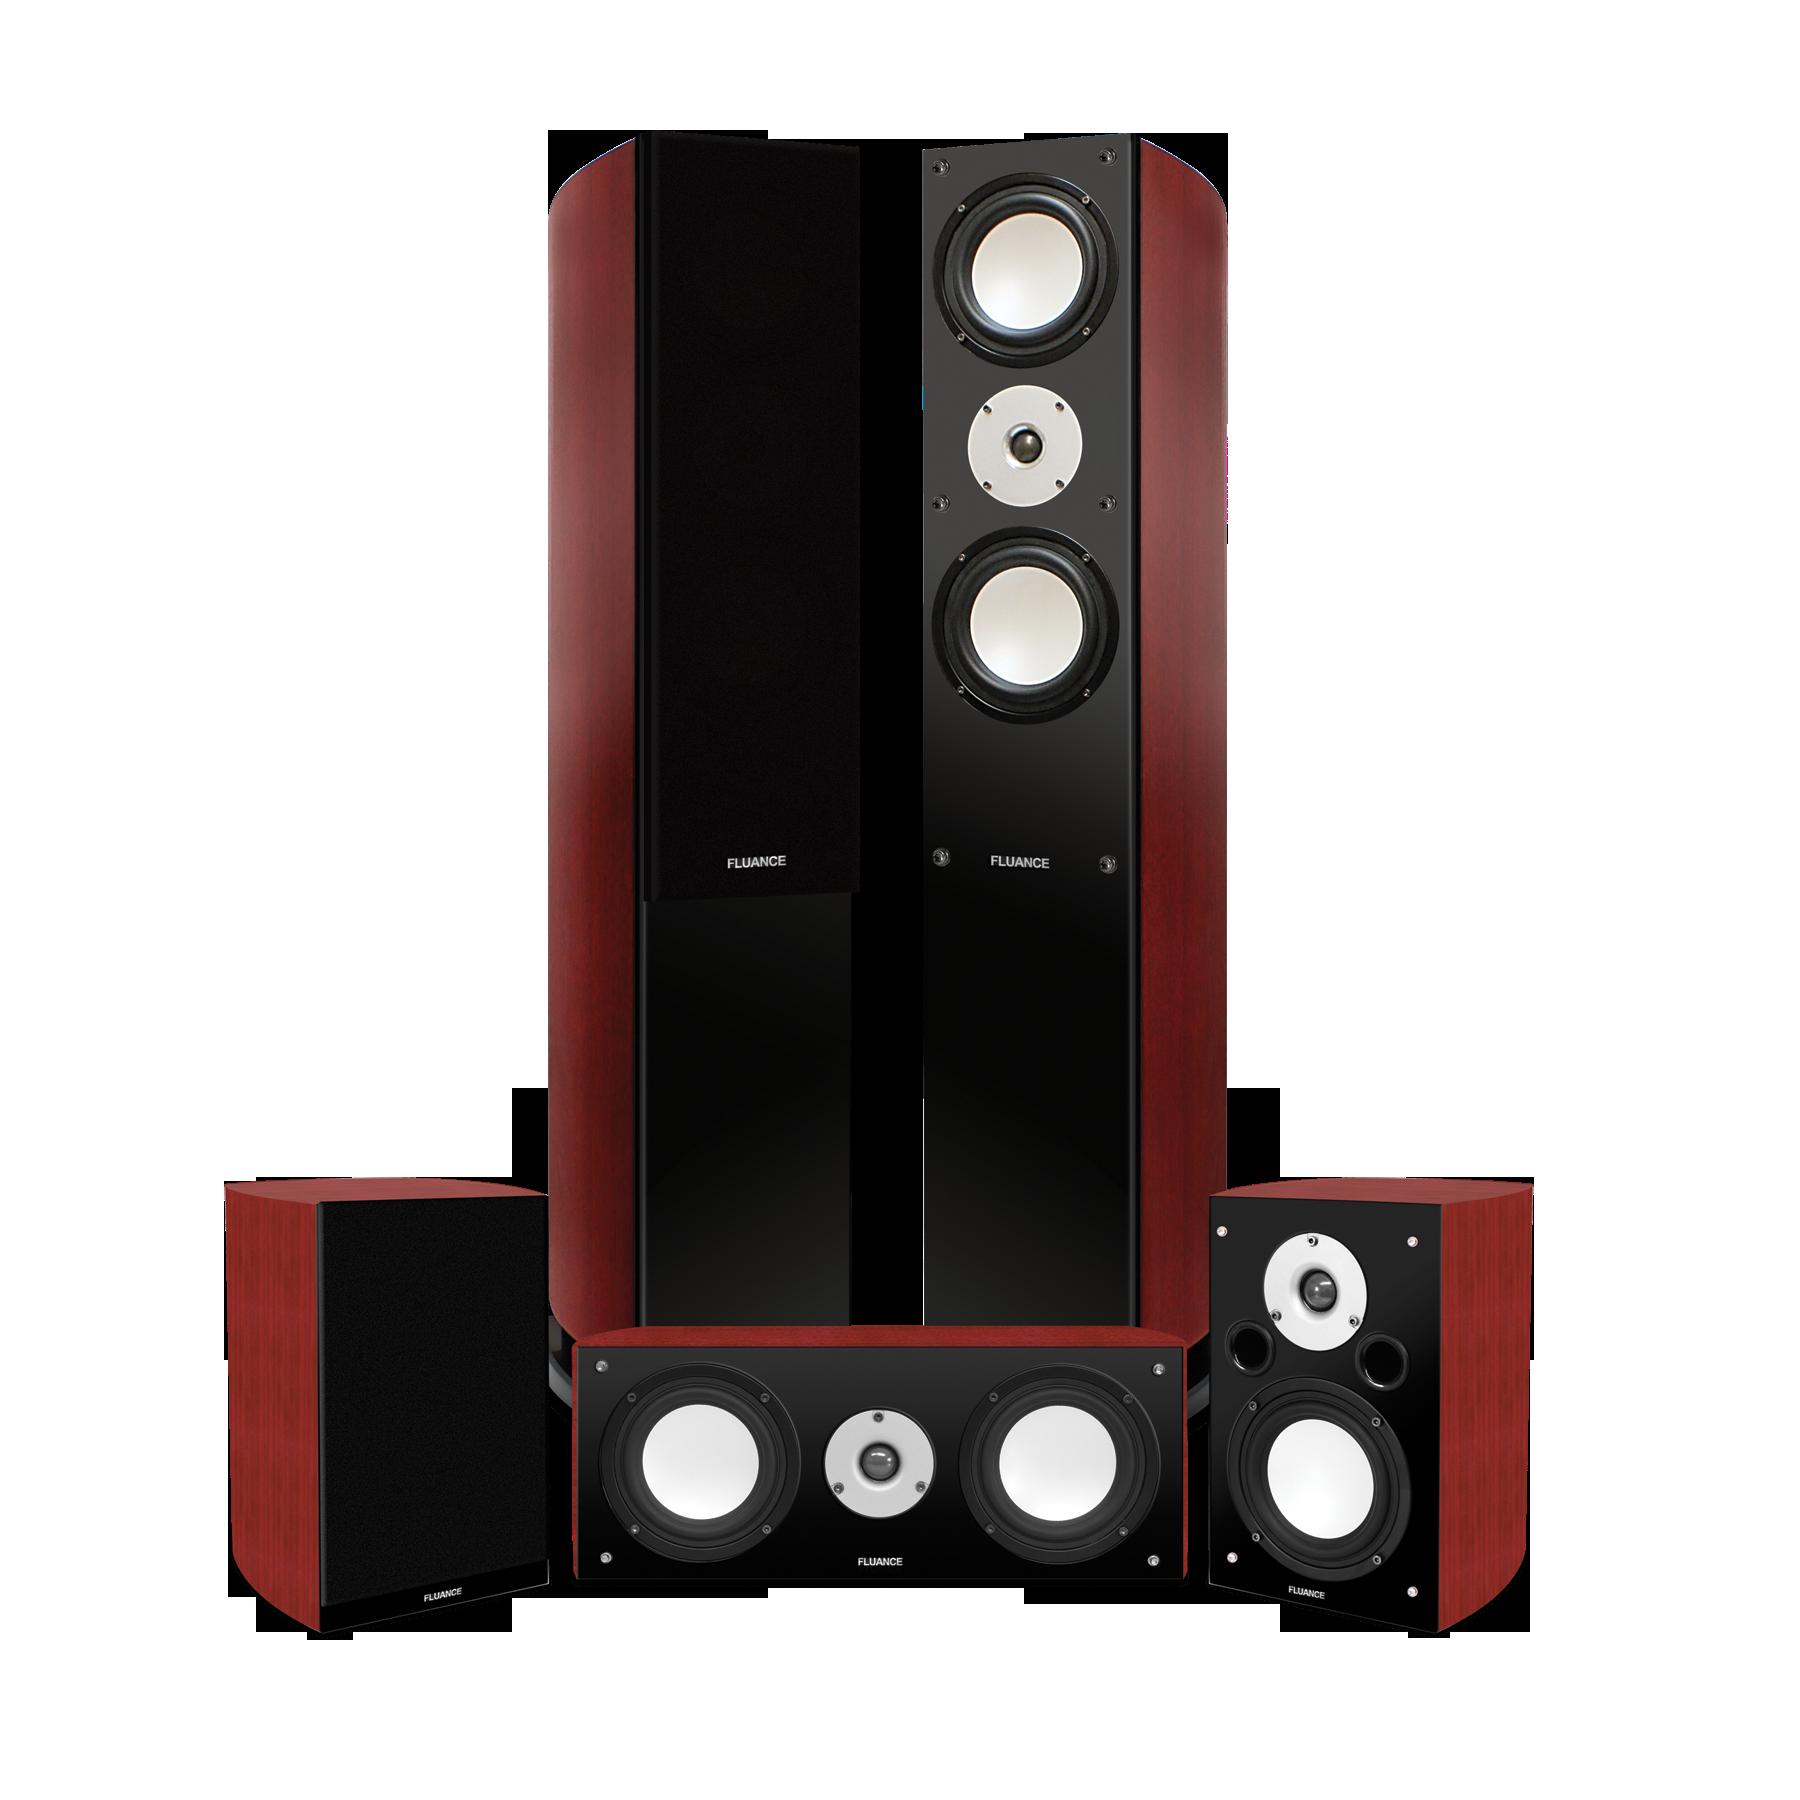 Fluance XLHTB Home Theater Speaker System